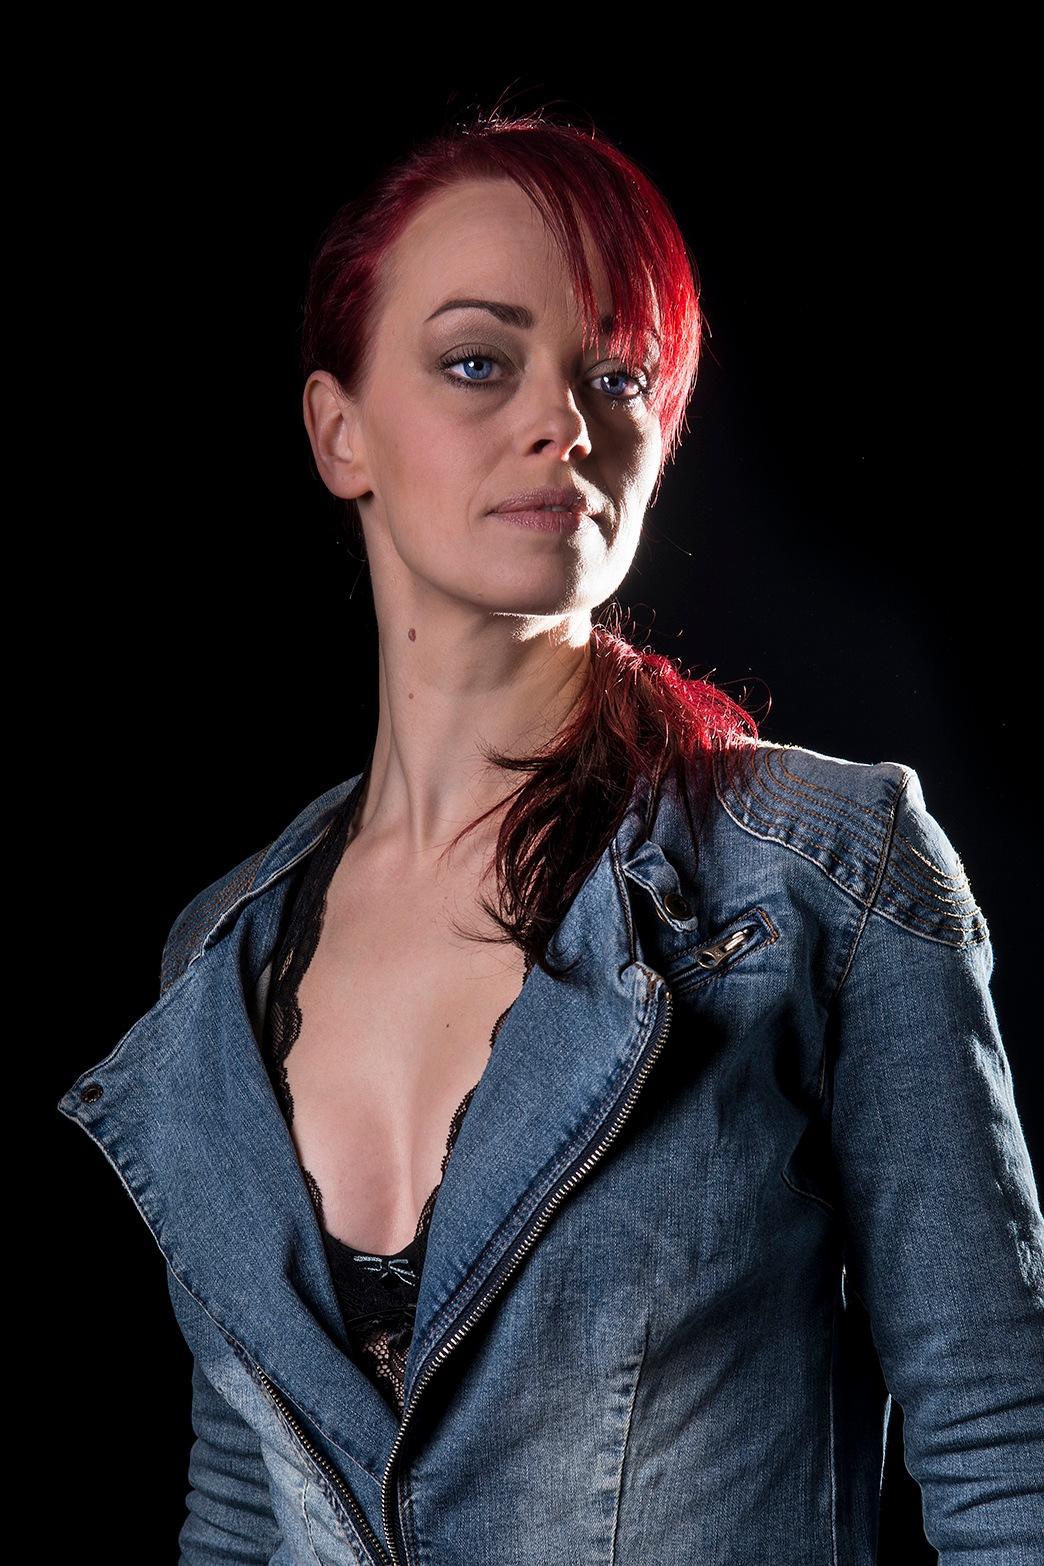 Blue eyed Redhead in Jeans Suit by Edward Draijer - EGD Fotografie